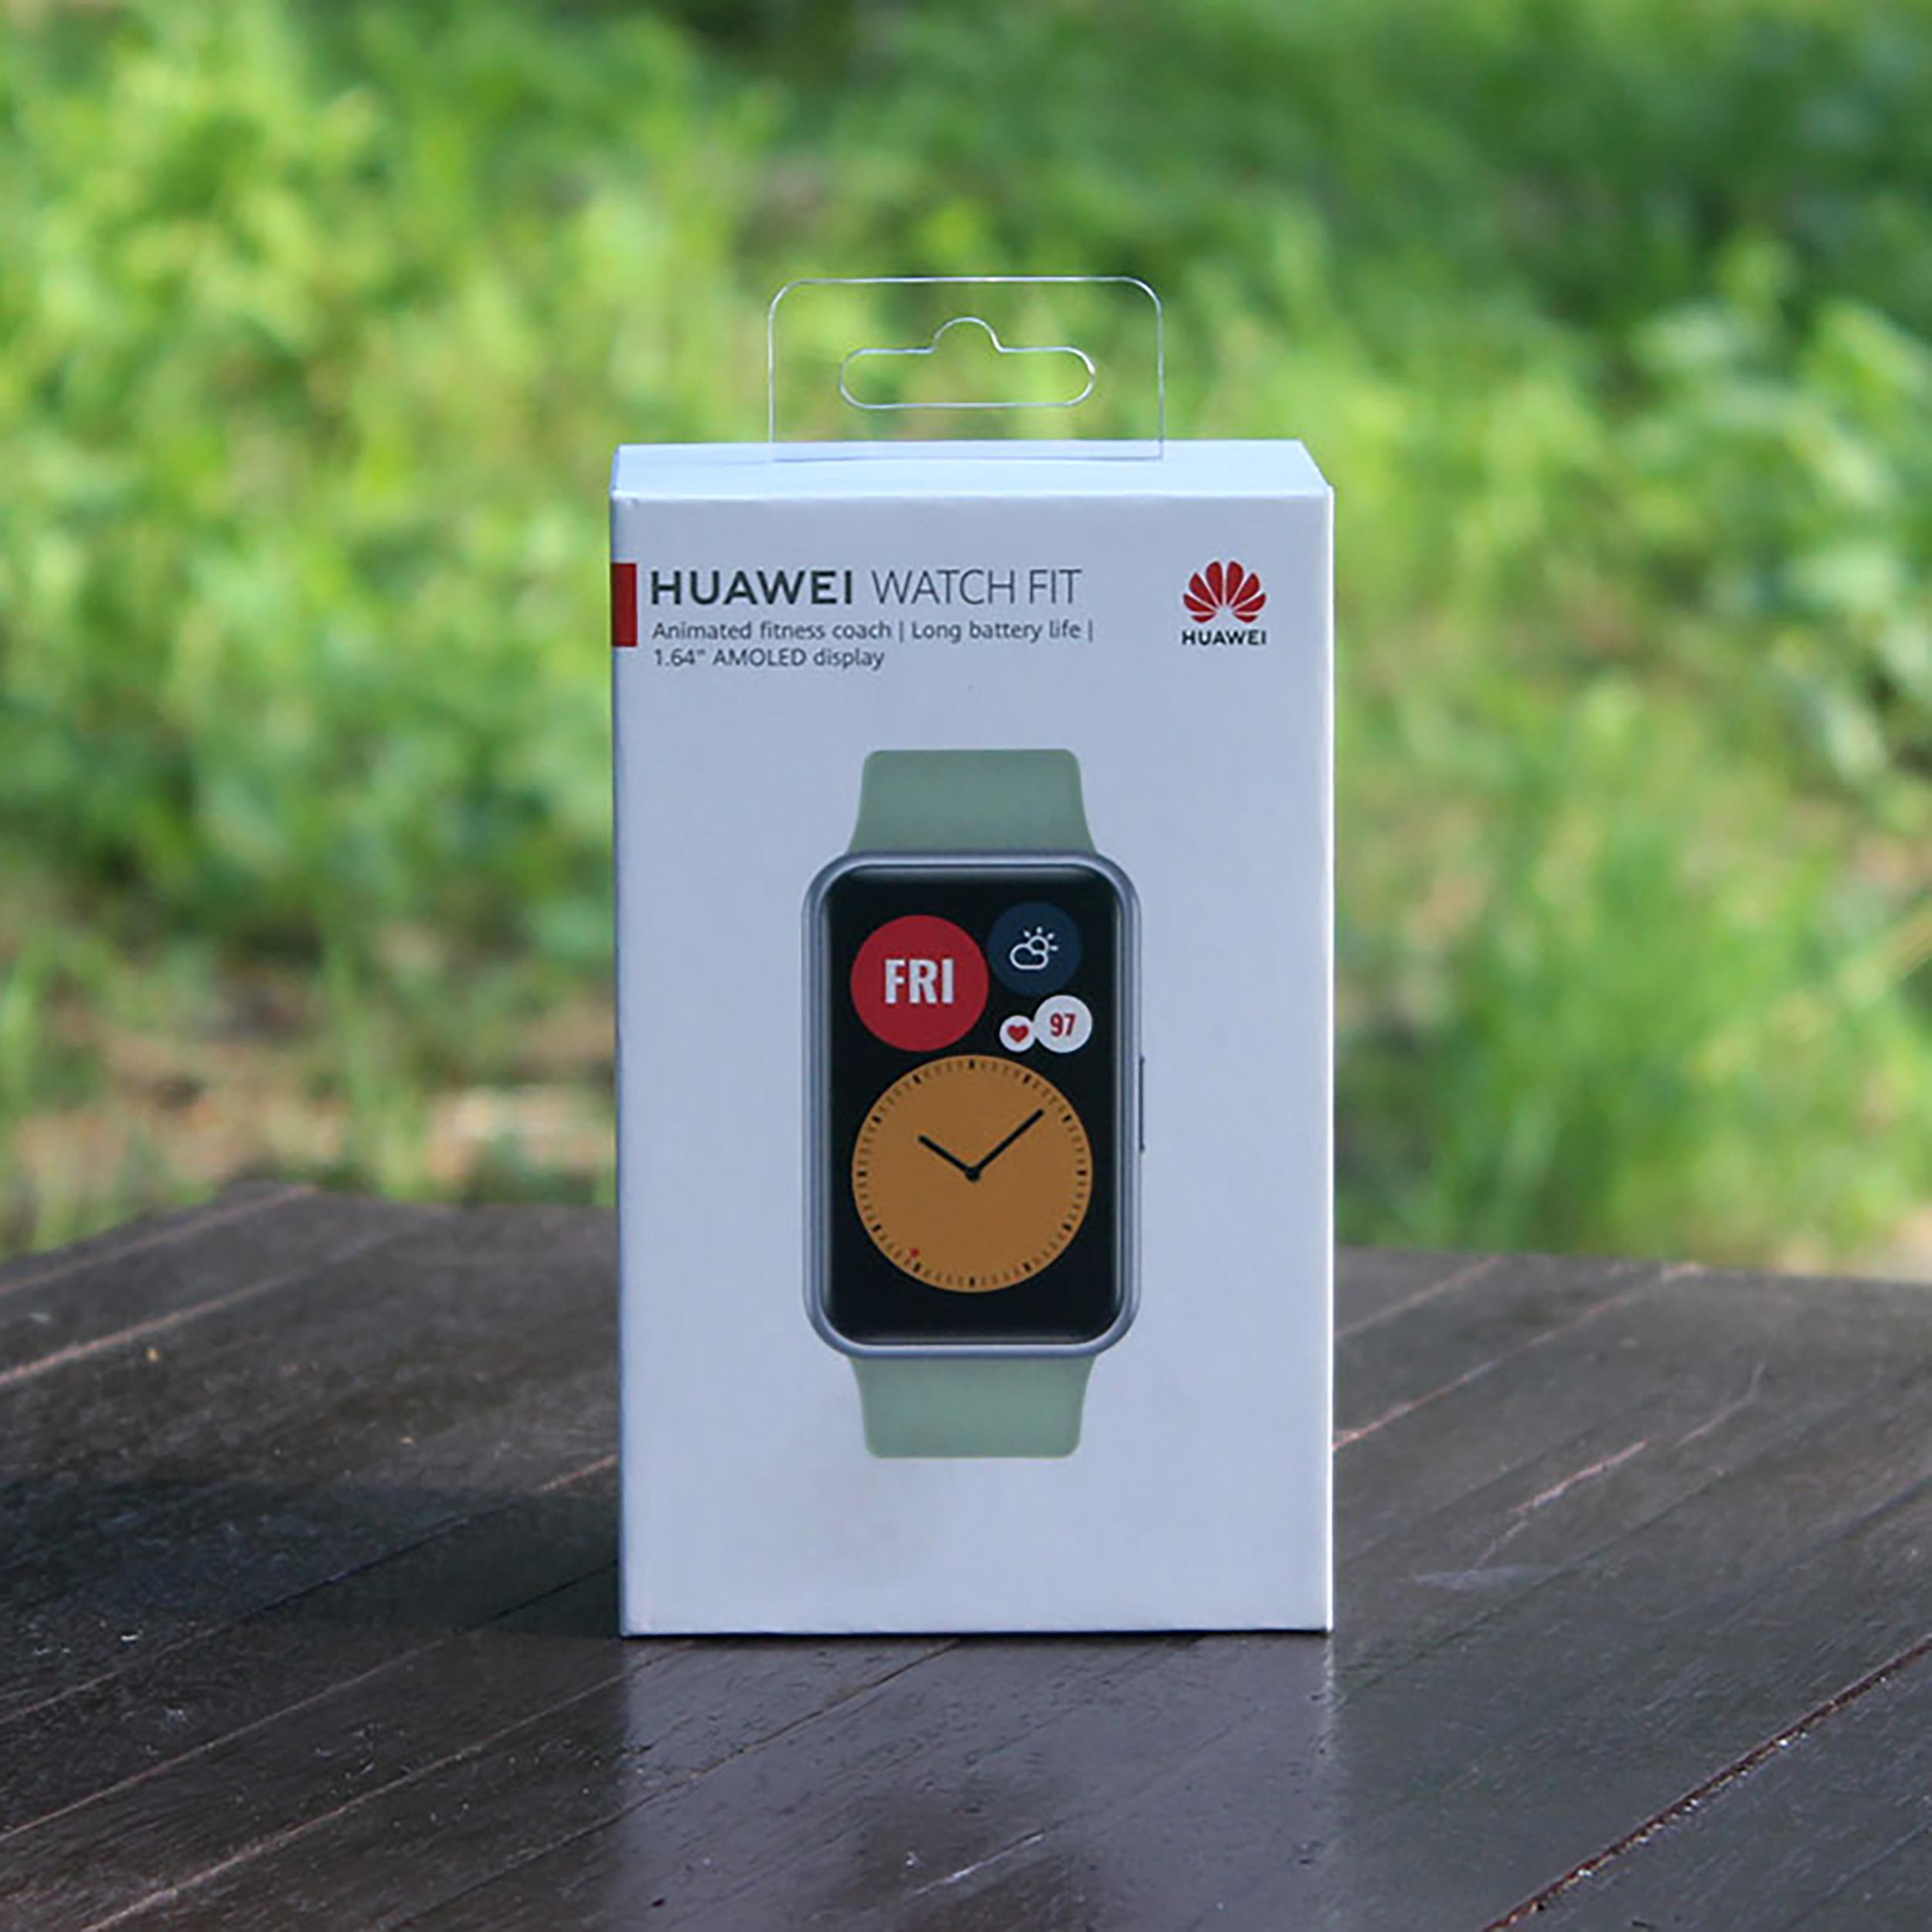 ساعت هوشمند هوآوی مدل WATCH FIT main 1 9